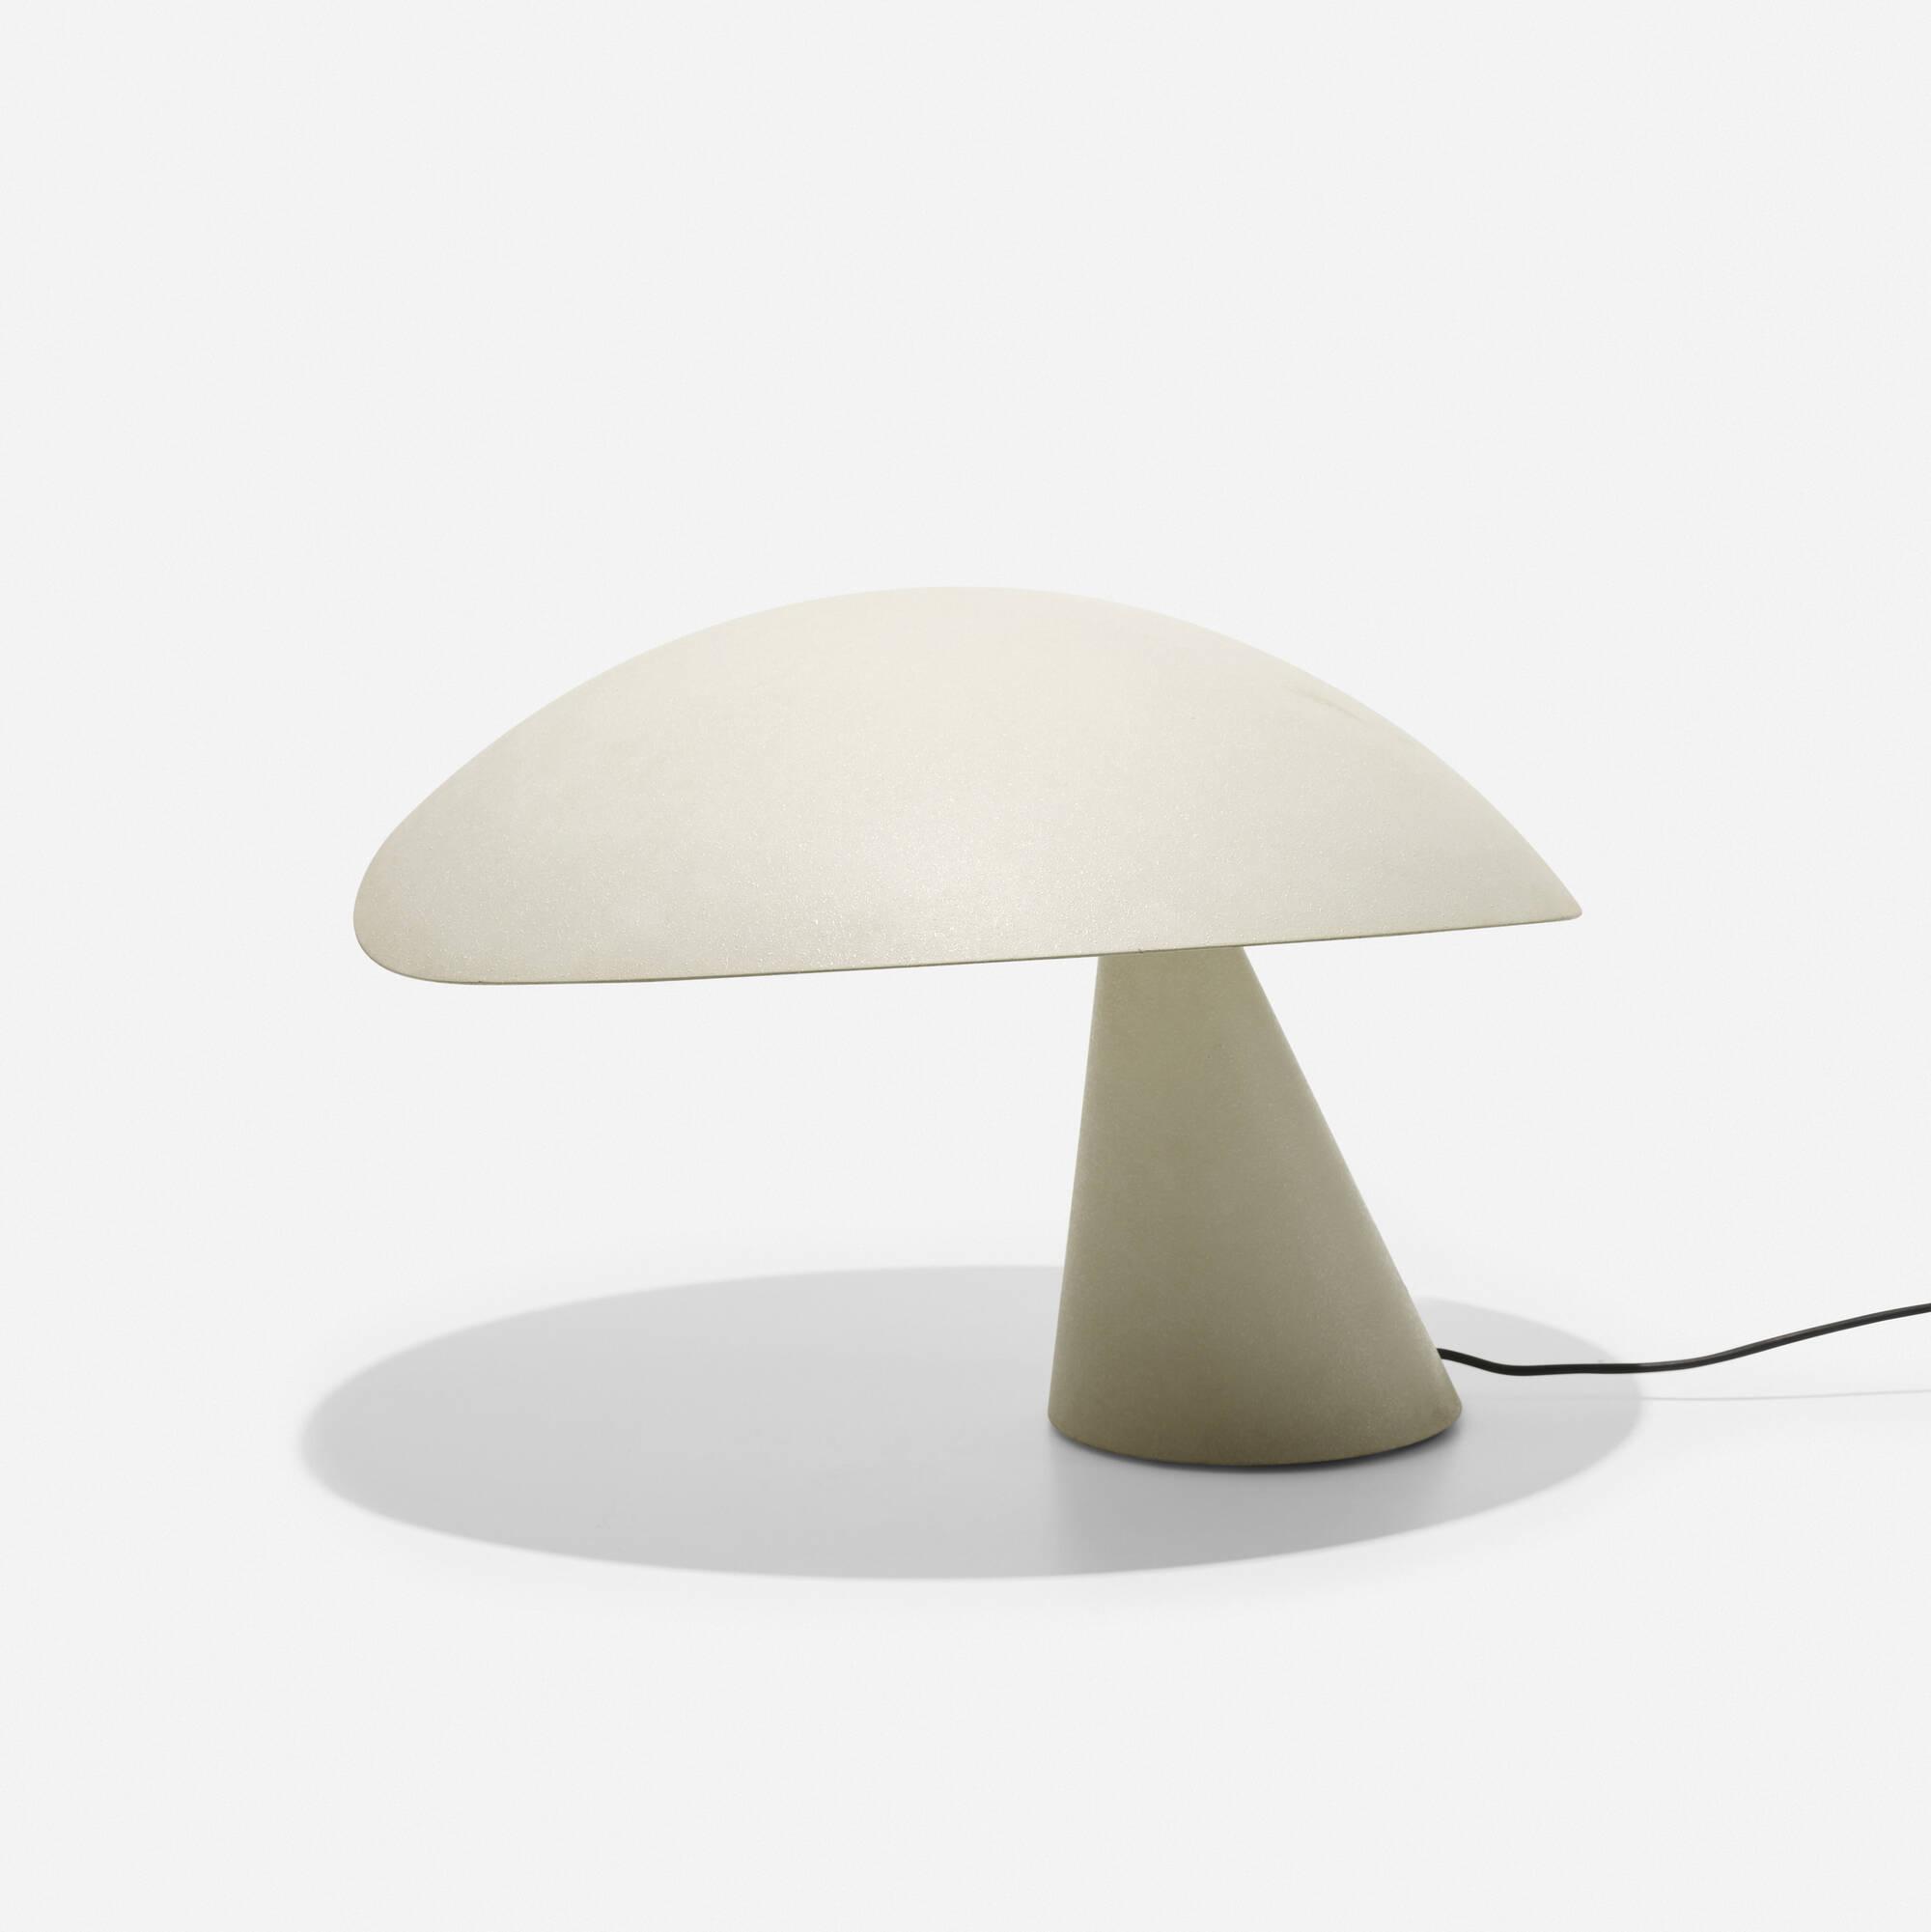 123: Masayuki Kurokawa / Lavinia table lamp (2 of 2)